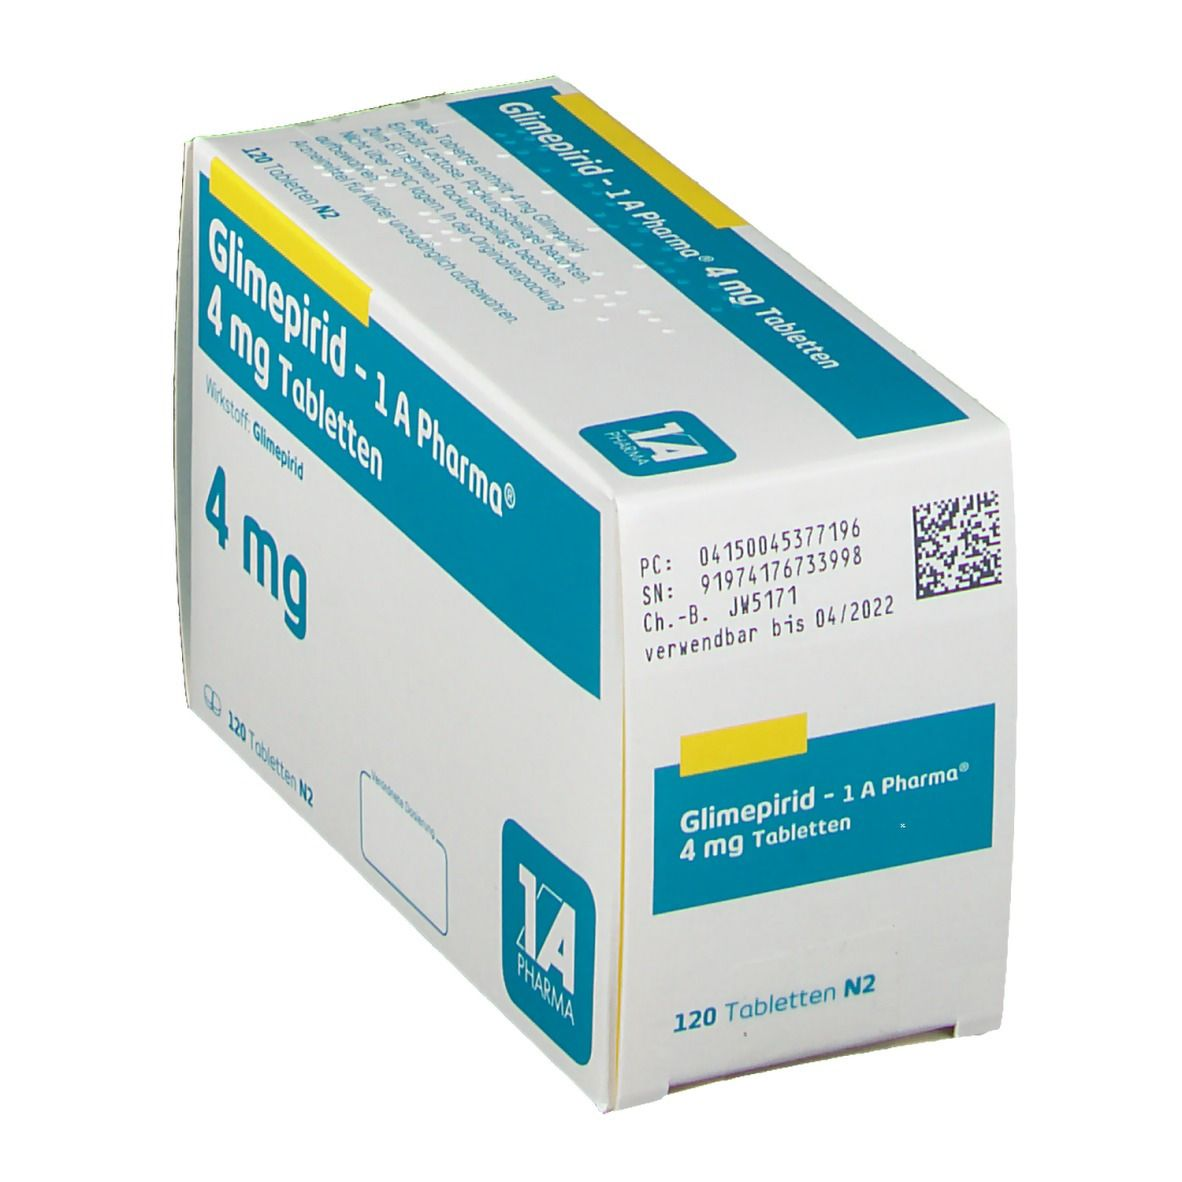 Glimepirid 1 A Pharma 4 mg Tabletten